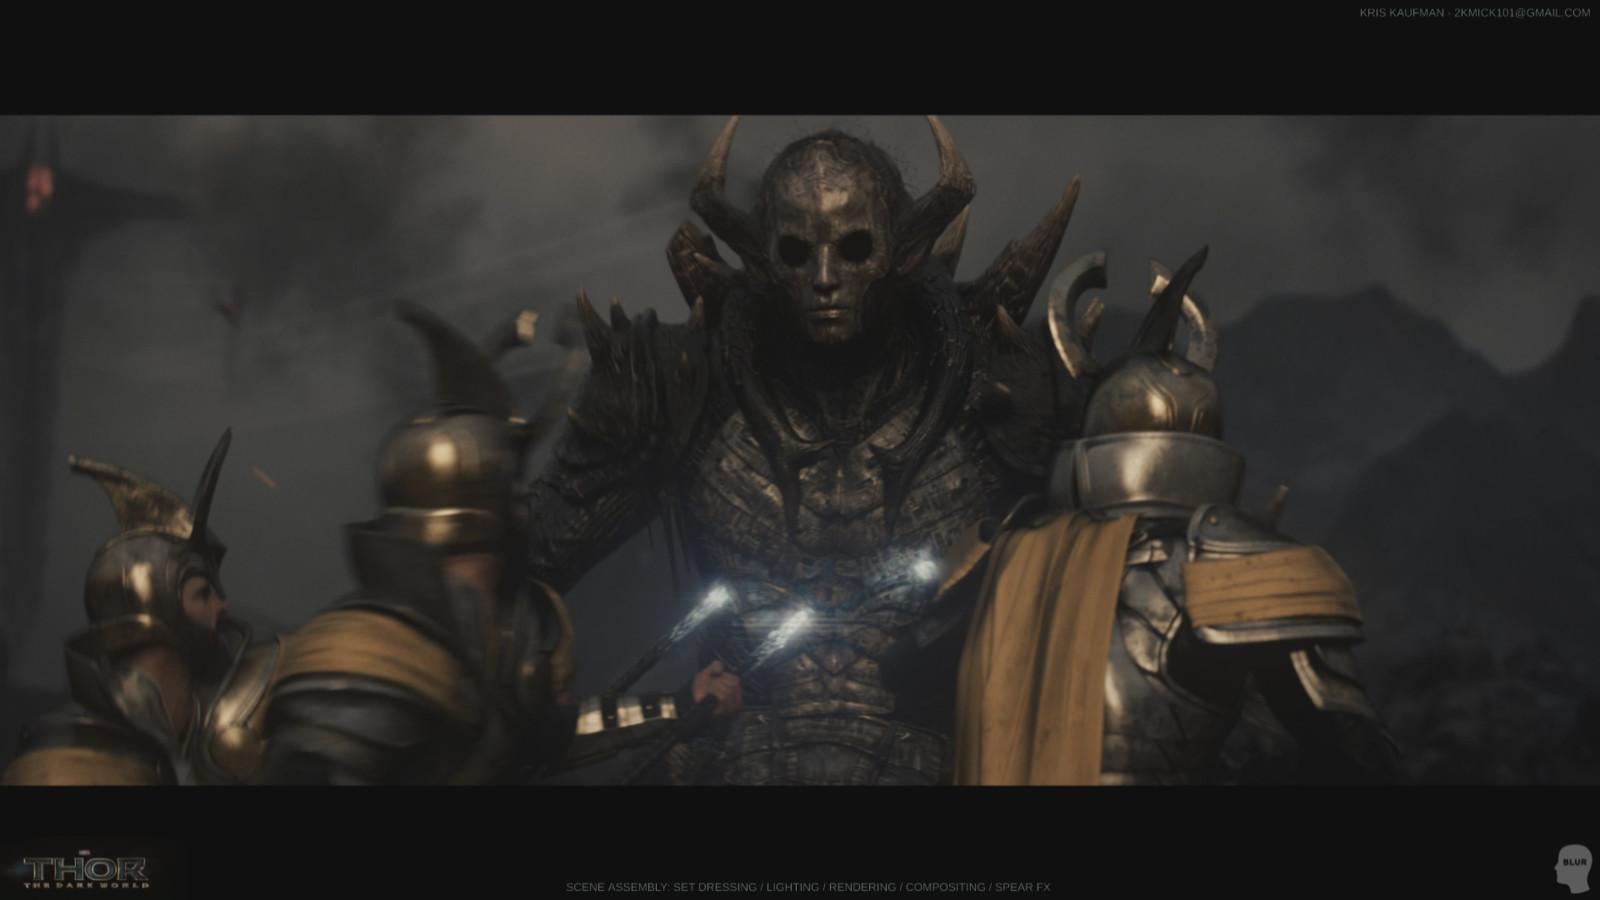 Thor The Dark World: Set Dressing / Lighting / Rendering / Compositing